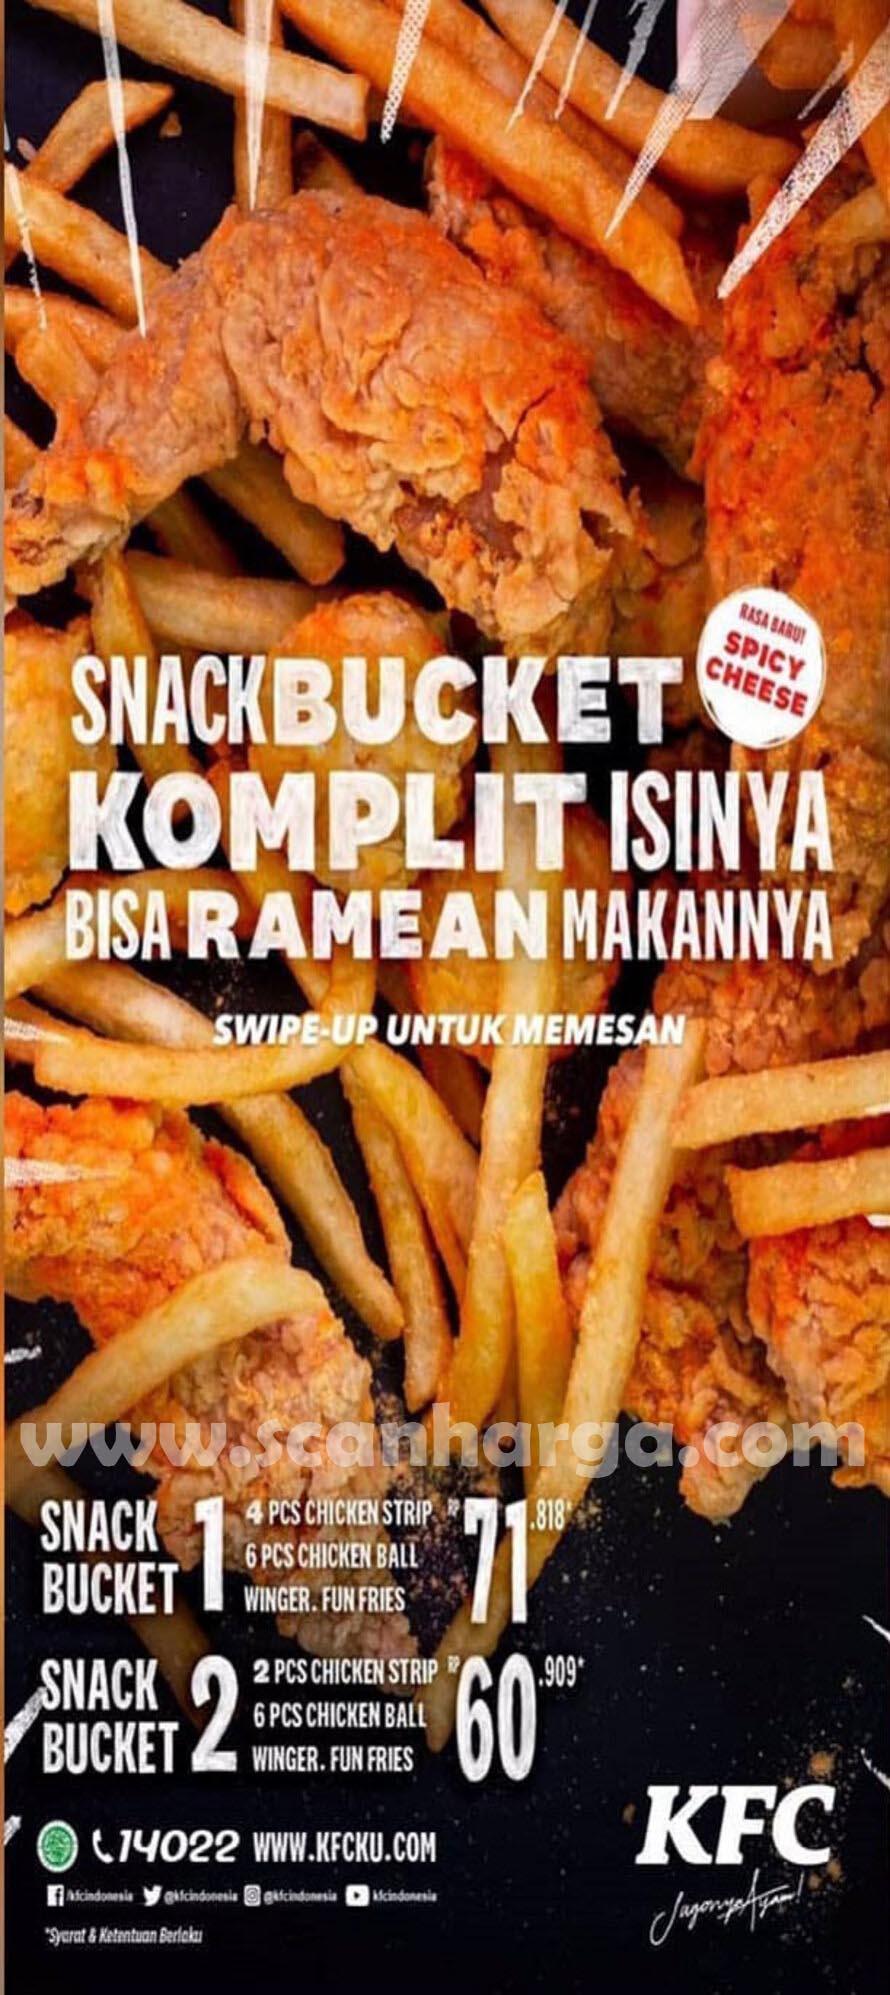 KFC Snack Bucket Rasa Baru - KFC Spicy Cheese harga mulai Rp 60Rb-an*